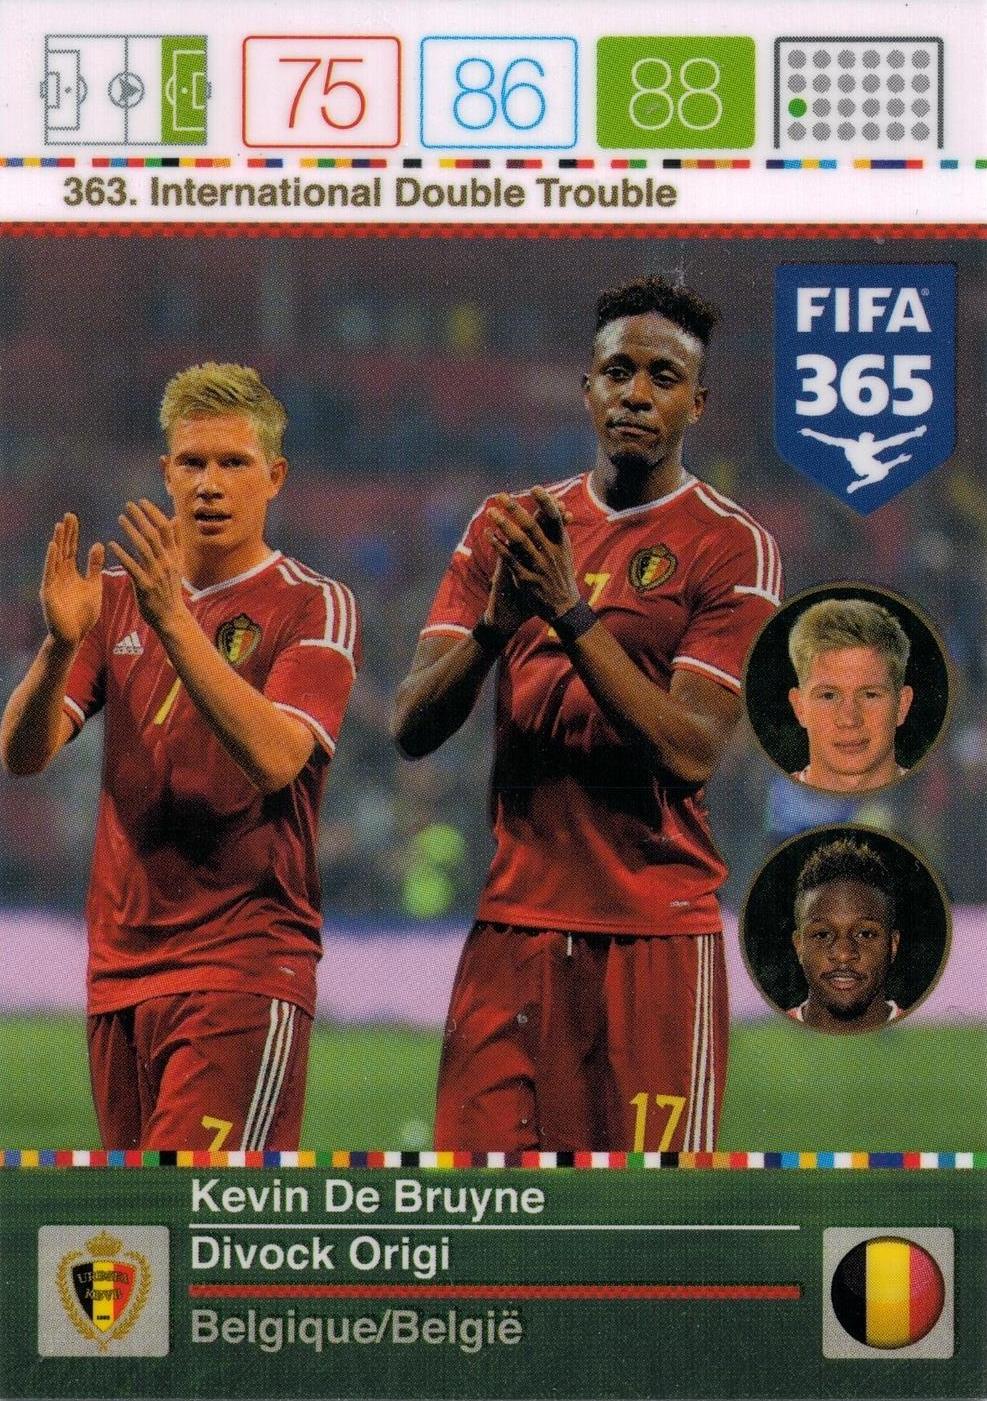 Fifa 365 Adrenalyn XL-nº 208 Michy Batshuayi-Goal Machine